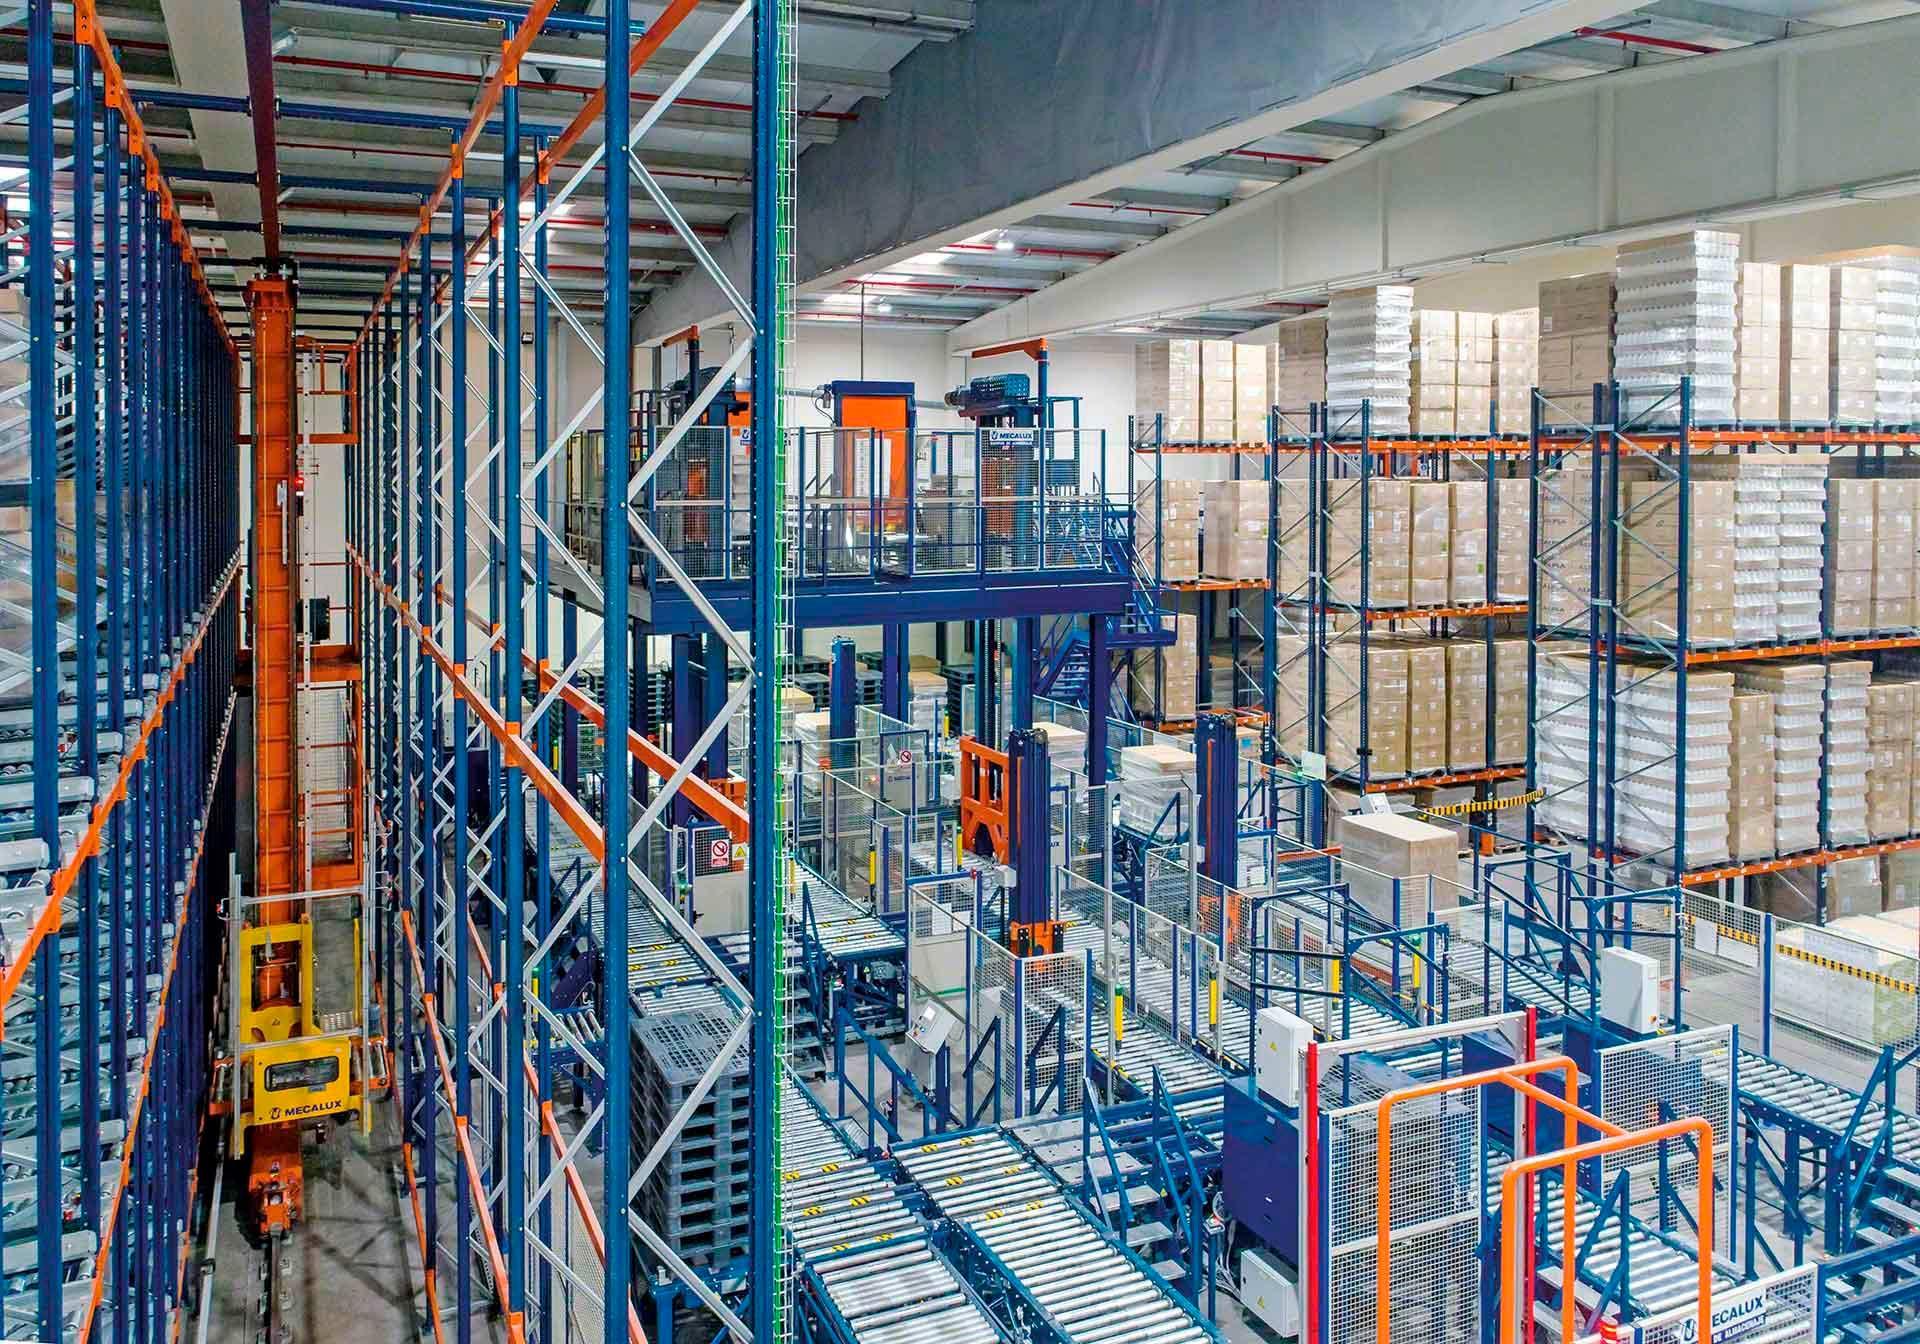 Warehouse robotics in the Logistics 4.0 era